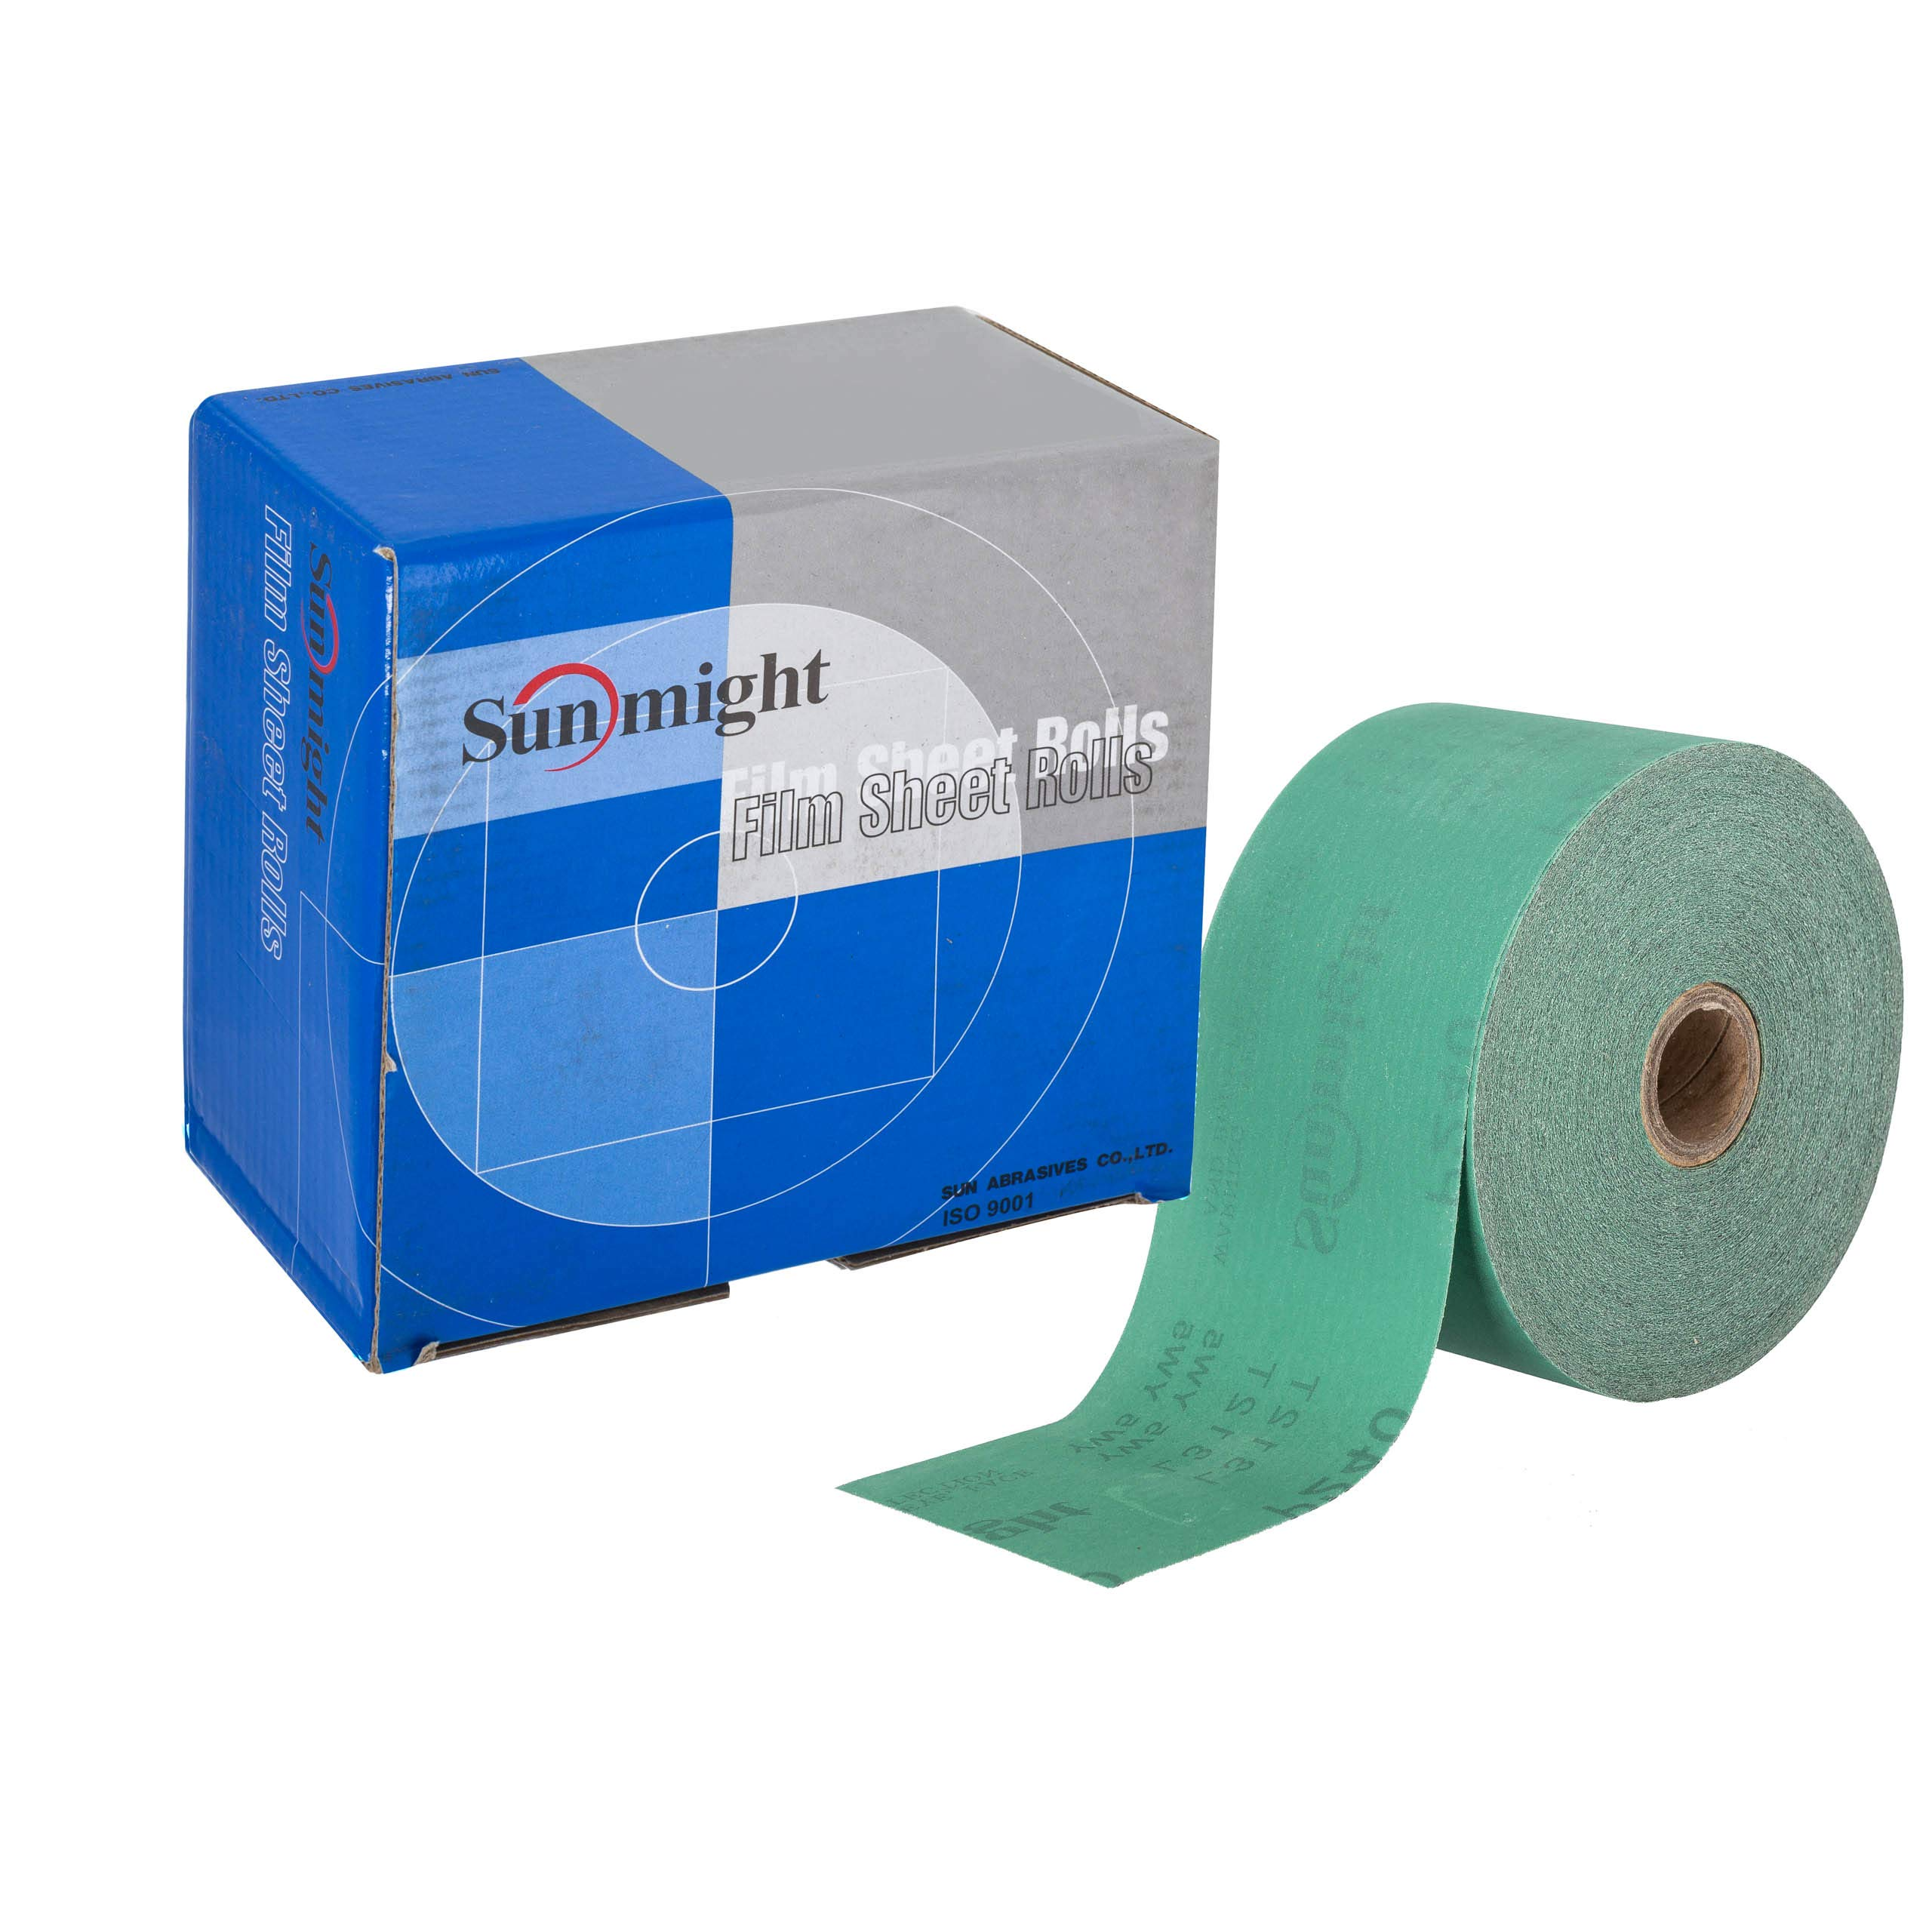 Sunmight 22110 1 Pack 2-3/4'' X 45 yd PSA Sheet Roll (Film Grit 180)